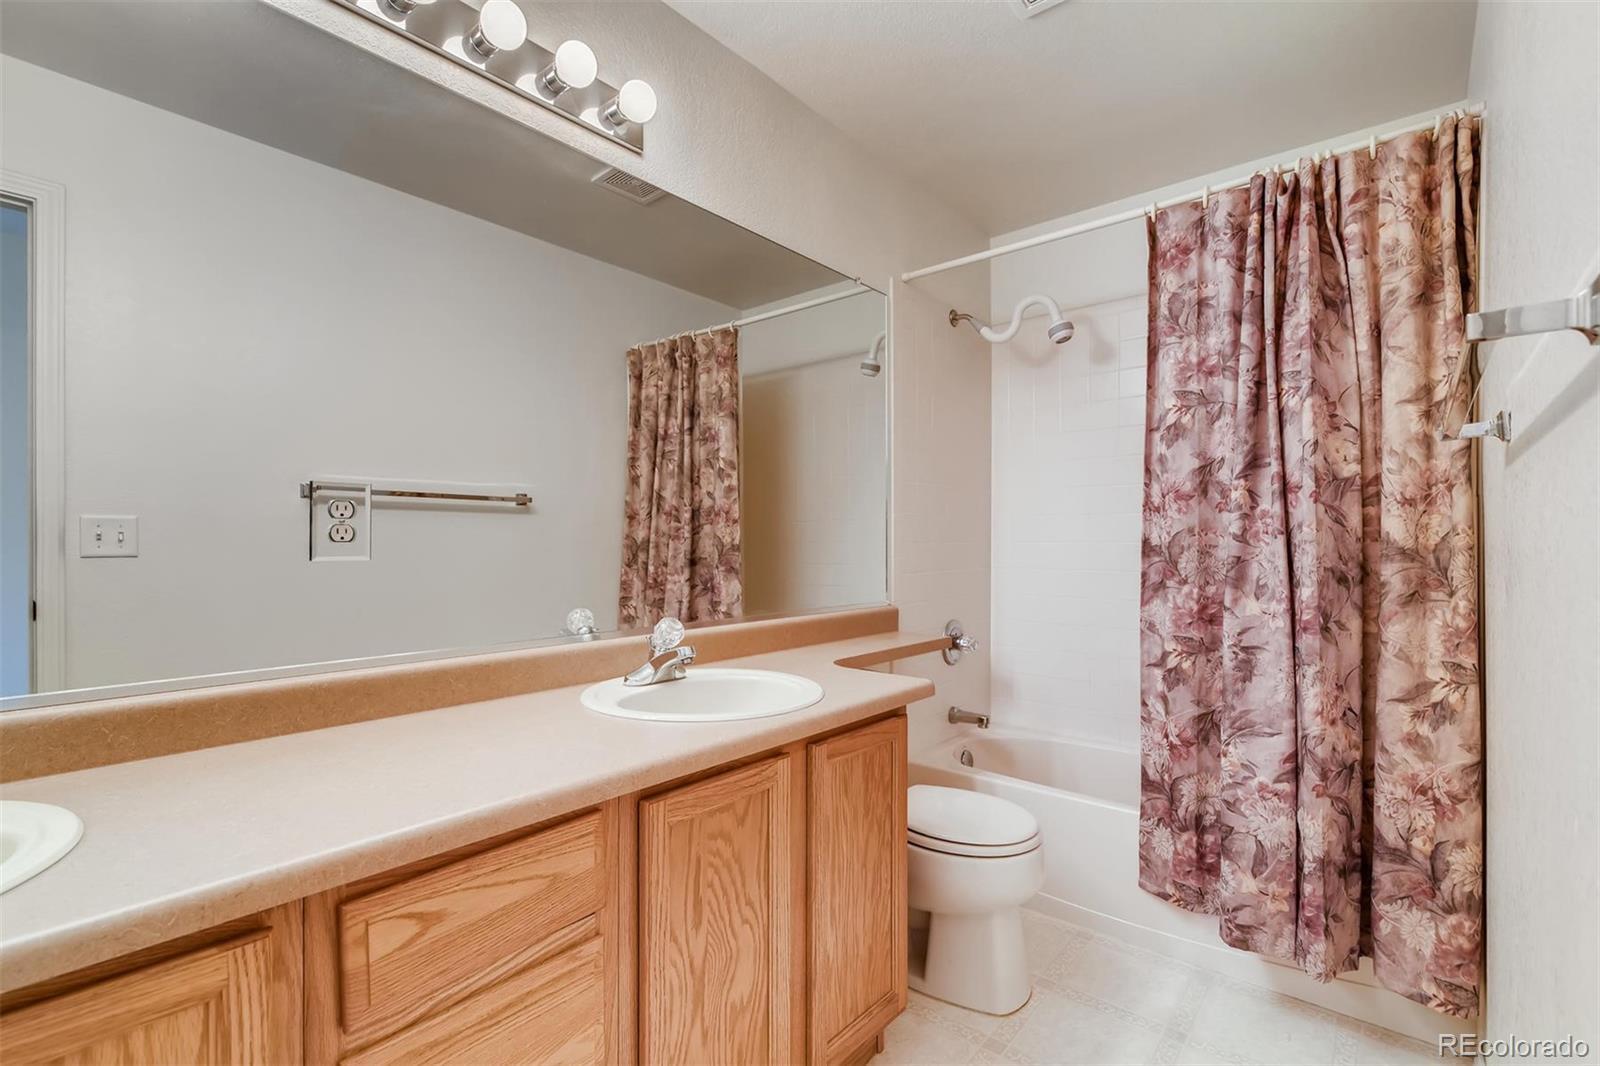 MLS# 9724731 - 25 - 498 Promontory Drive, Loveland, CO 80537